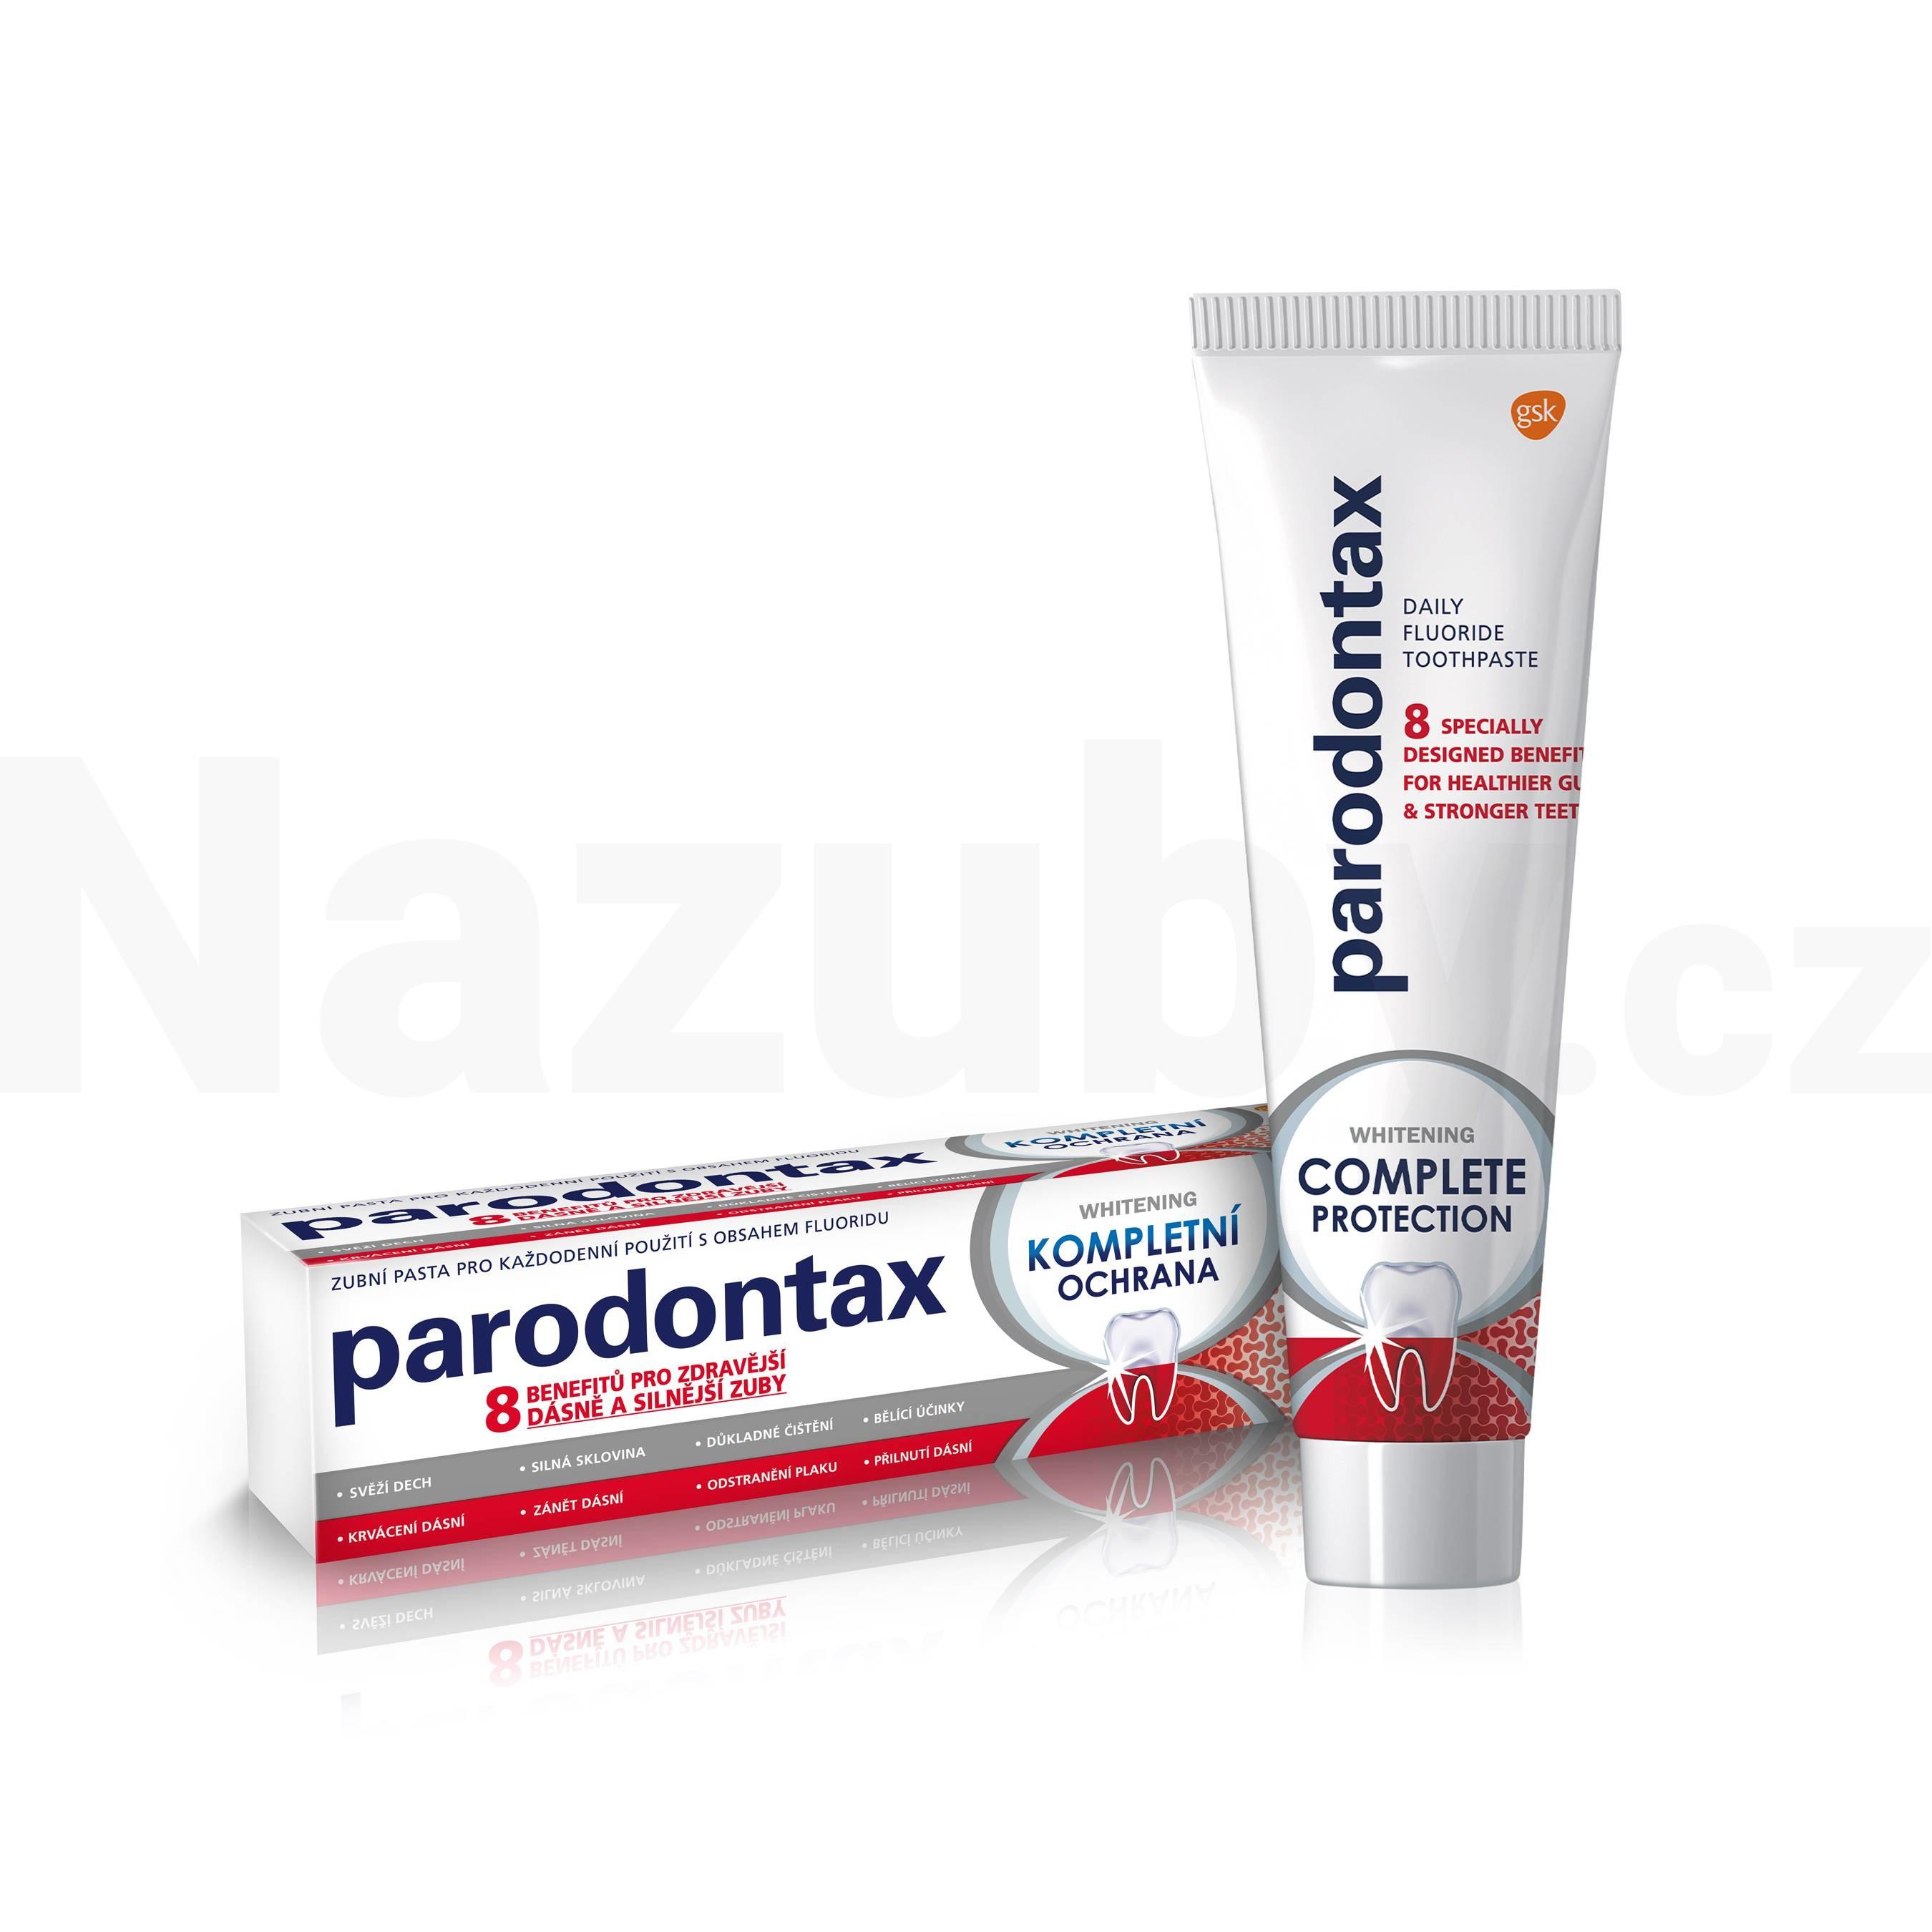 Parodontax Kompletní ochrana whitening 75 ml